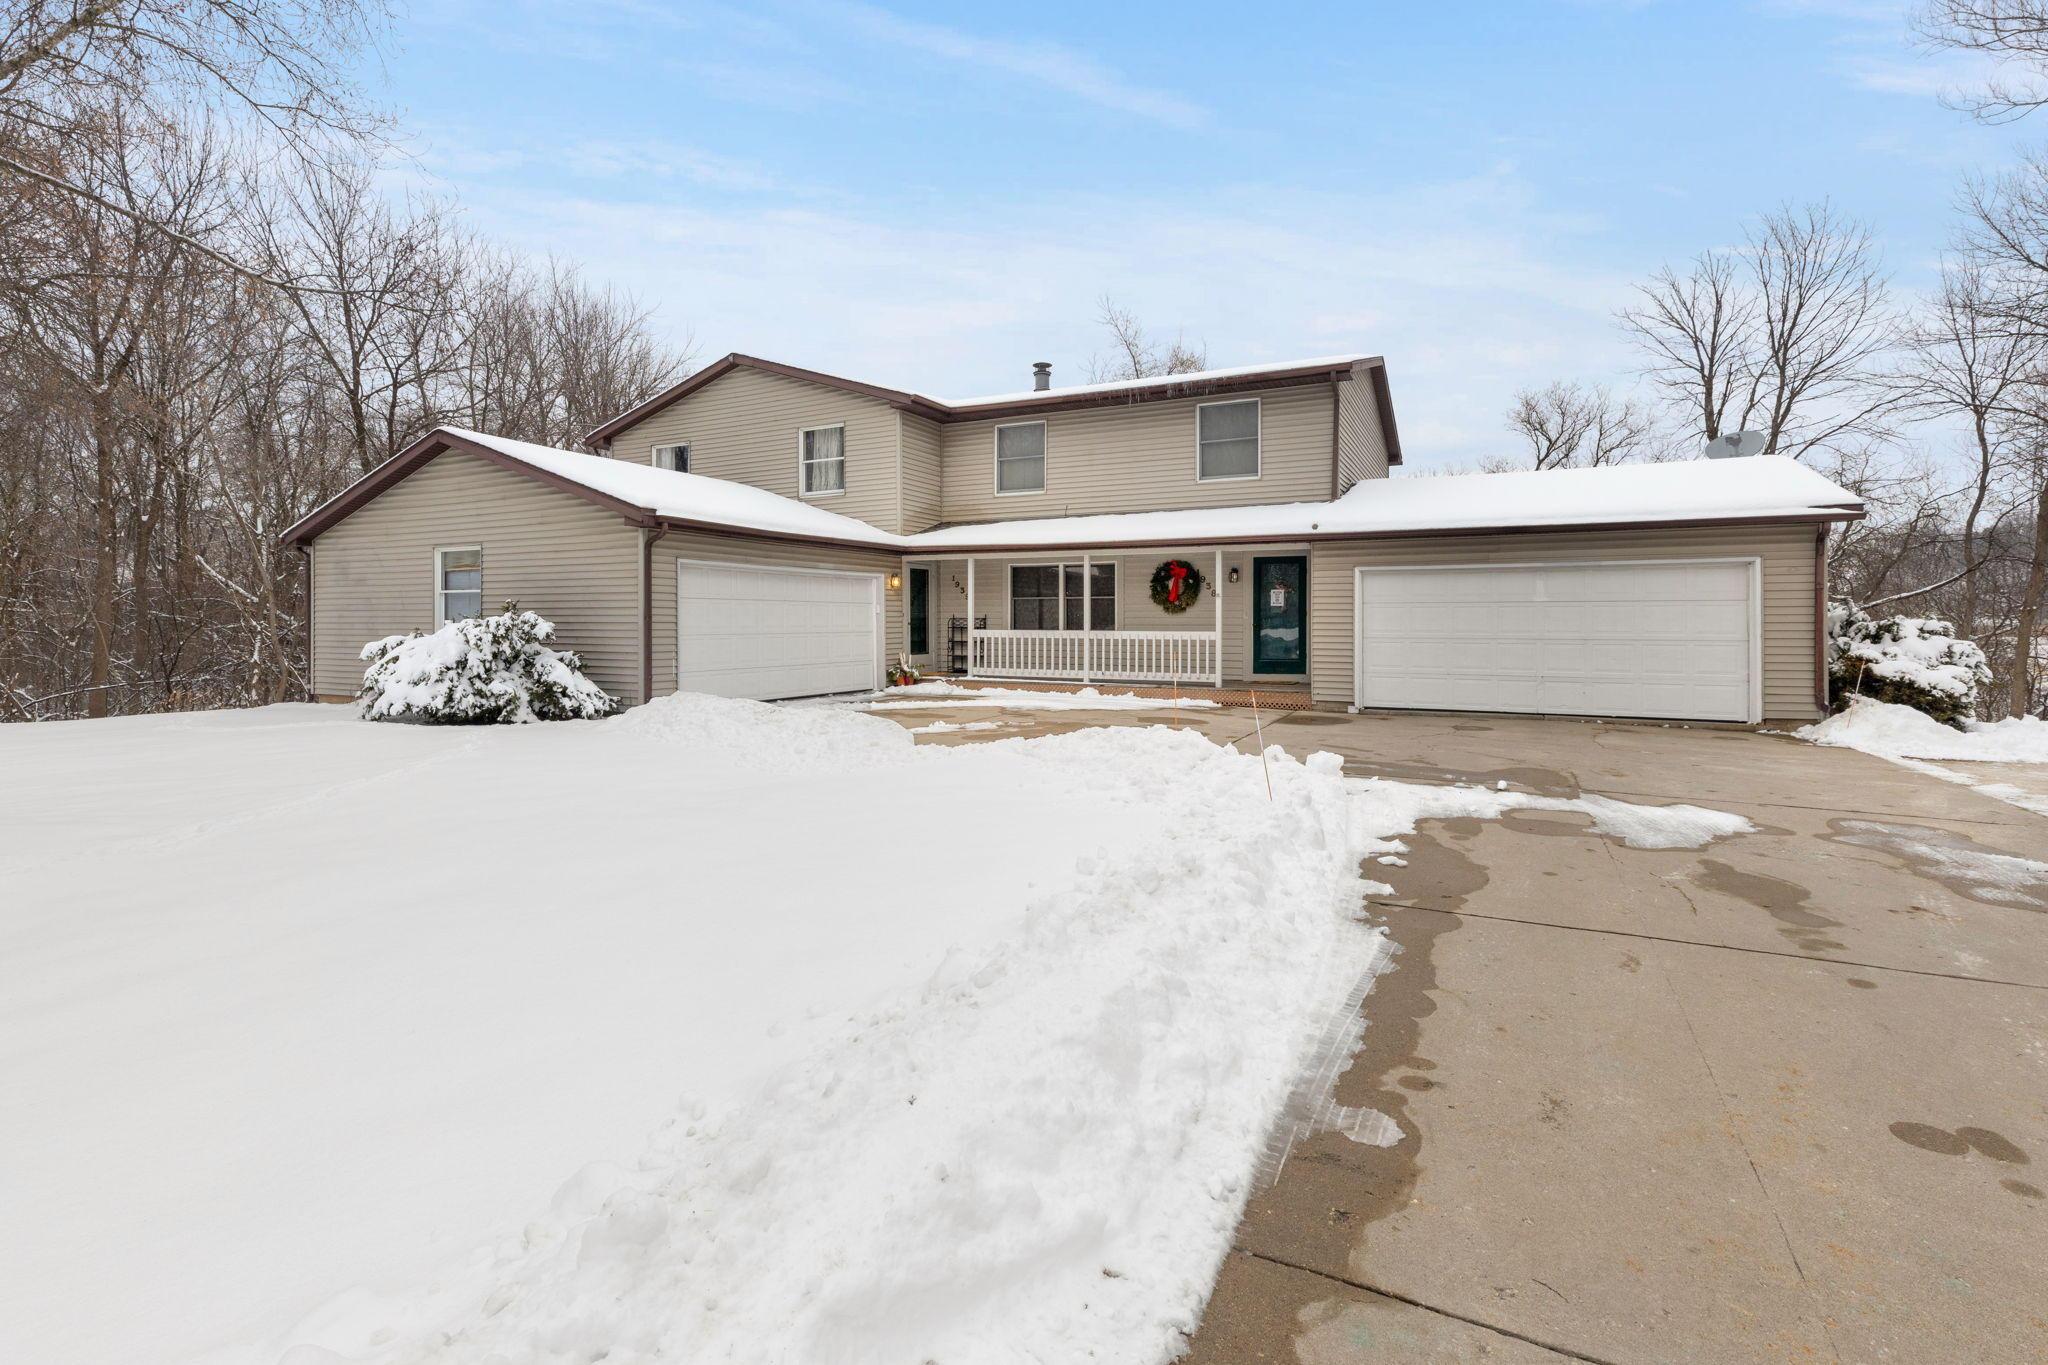 19380 Emerald Dr, Brookfield, Wisconsin 53045, 3 Bedrooms Bedrooms, 7 Rooms Rooms,3 BathroomsBathrooms,Two-Family,For Sale,Emerald Dr,3,1723171